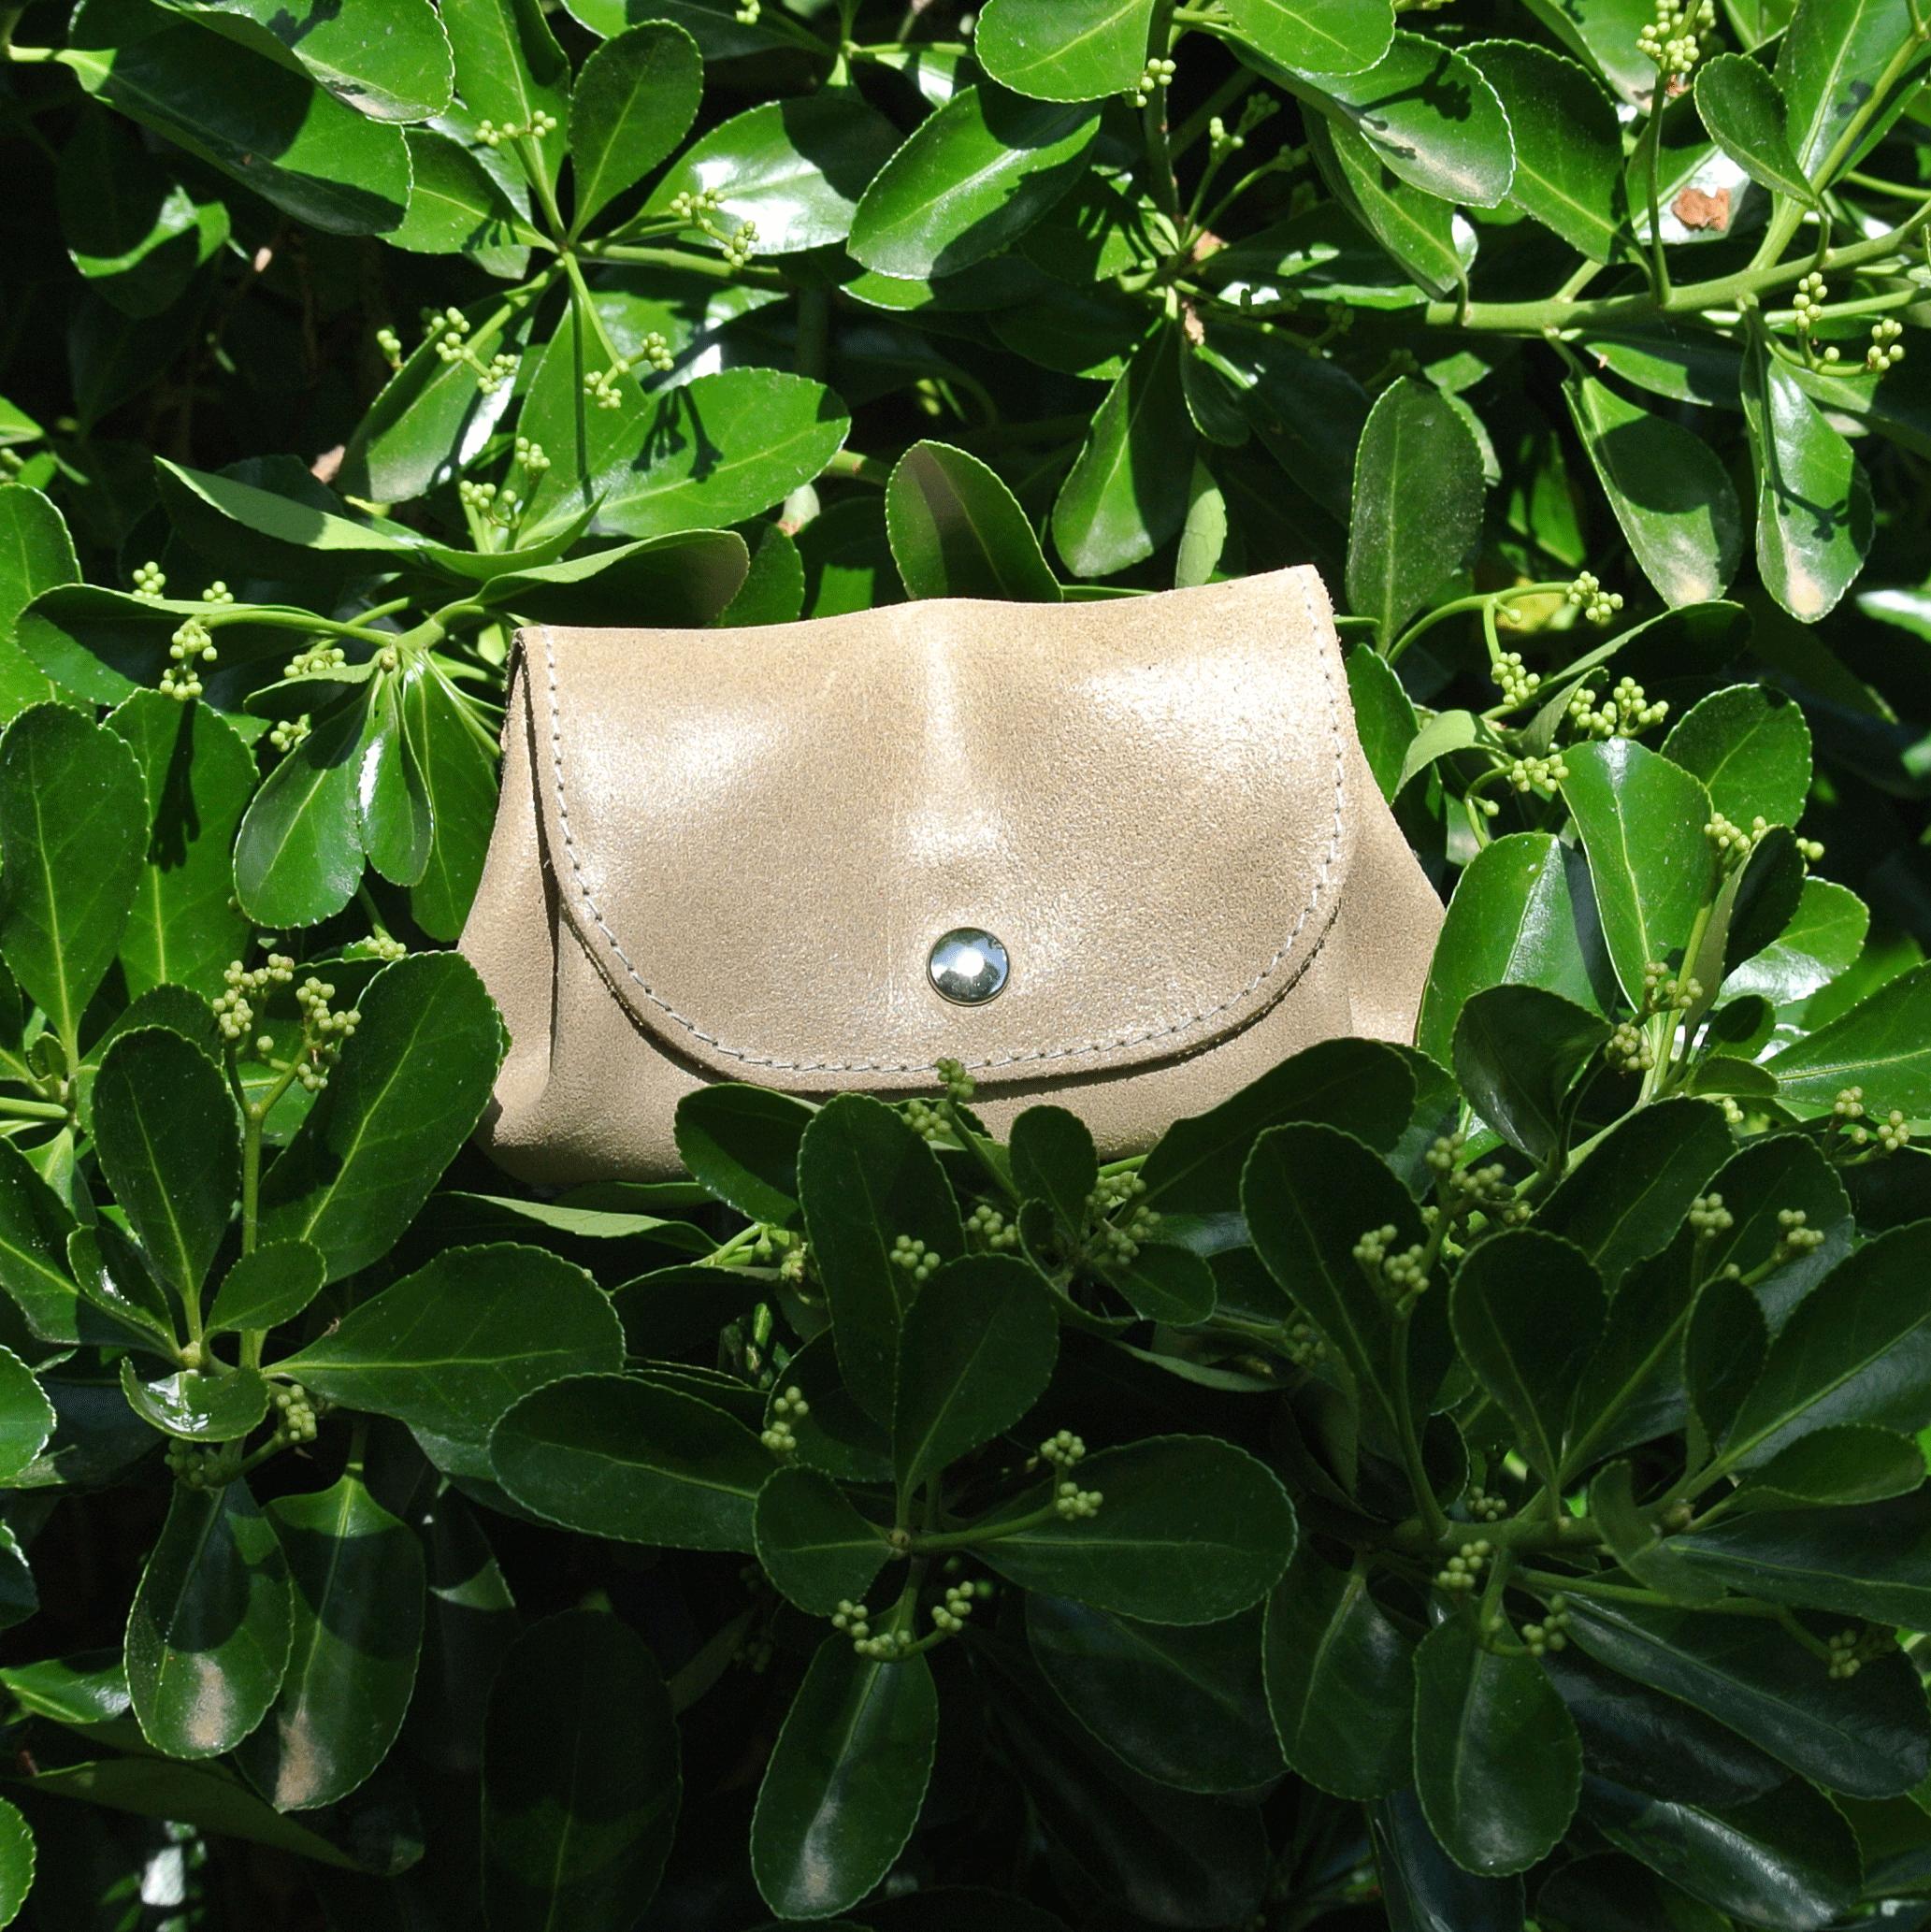 cuirs-fantaisies-la-cartabliere-fabrique-en-france-porte-monnaie-accordeon-en-cuir-retro-beige-coquillage